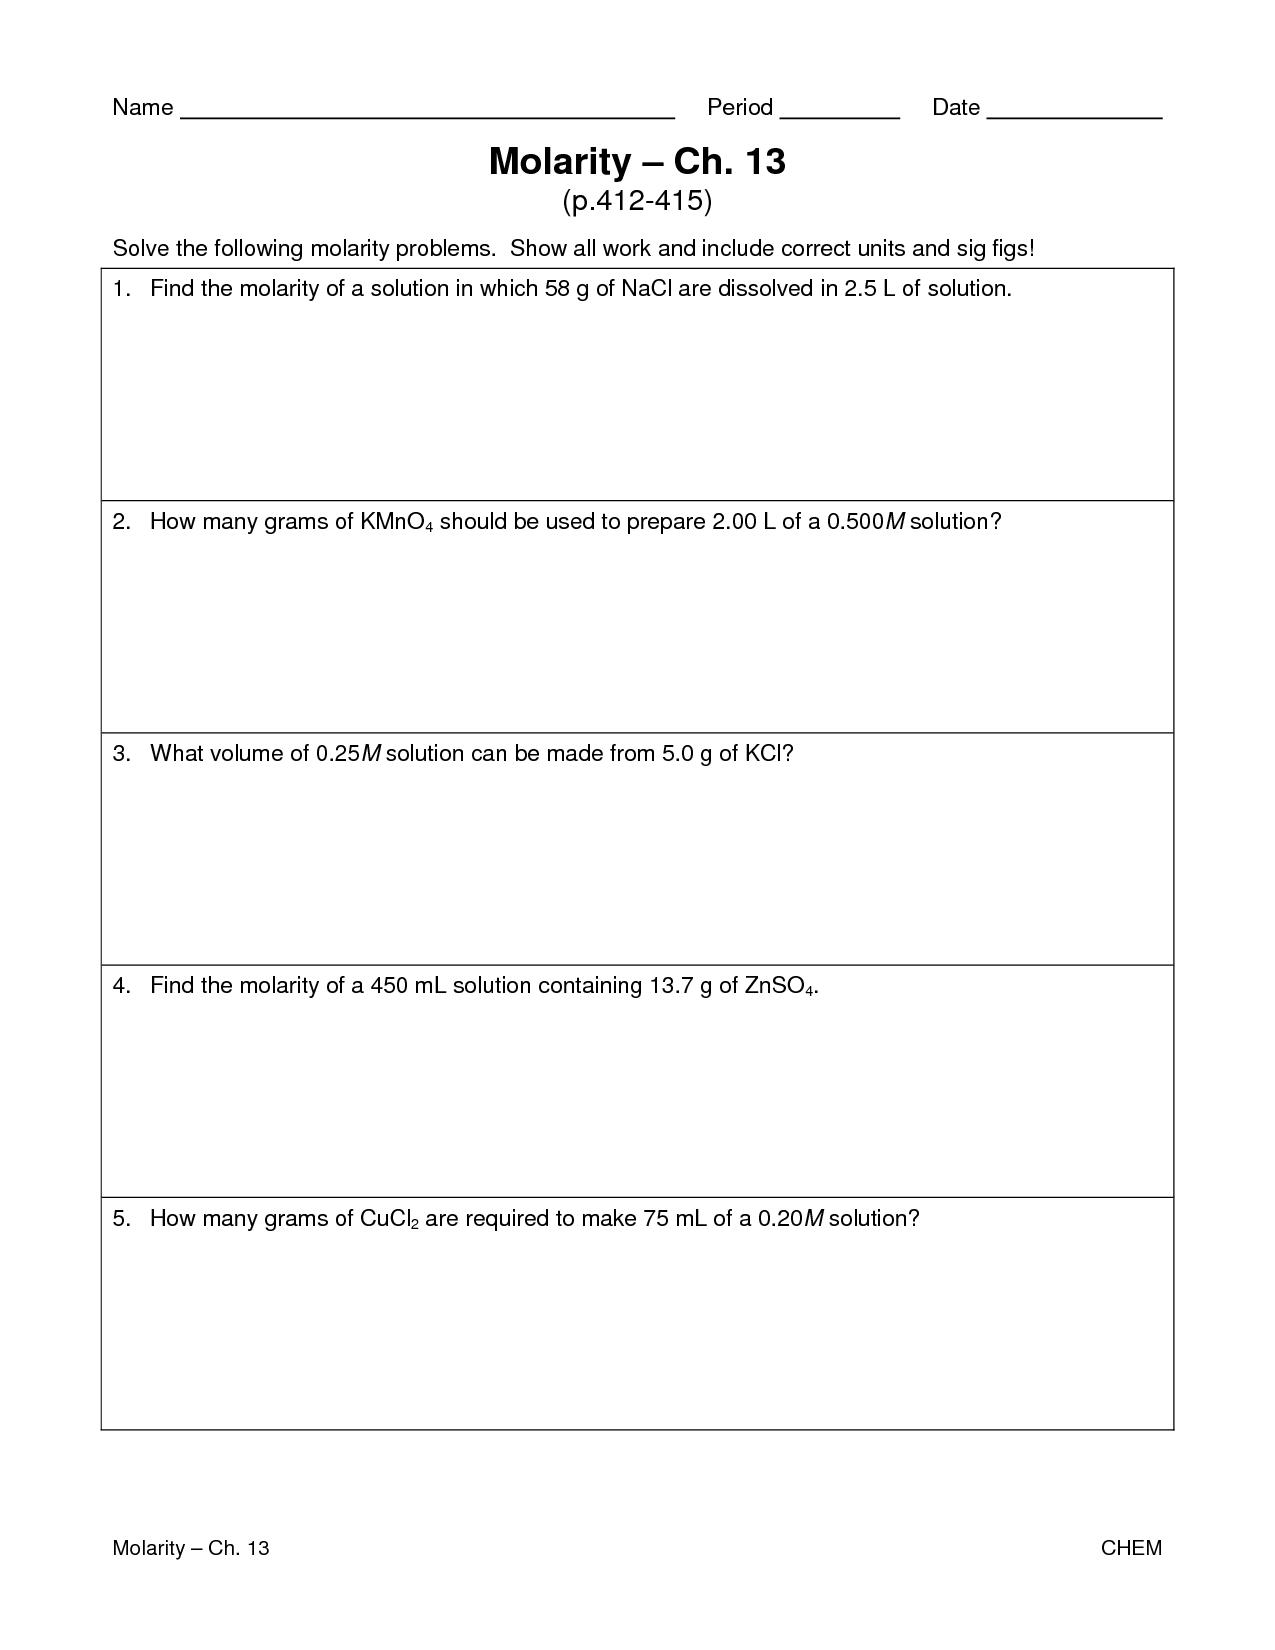 Molarity Worksheet Answer Key Chemistry